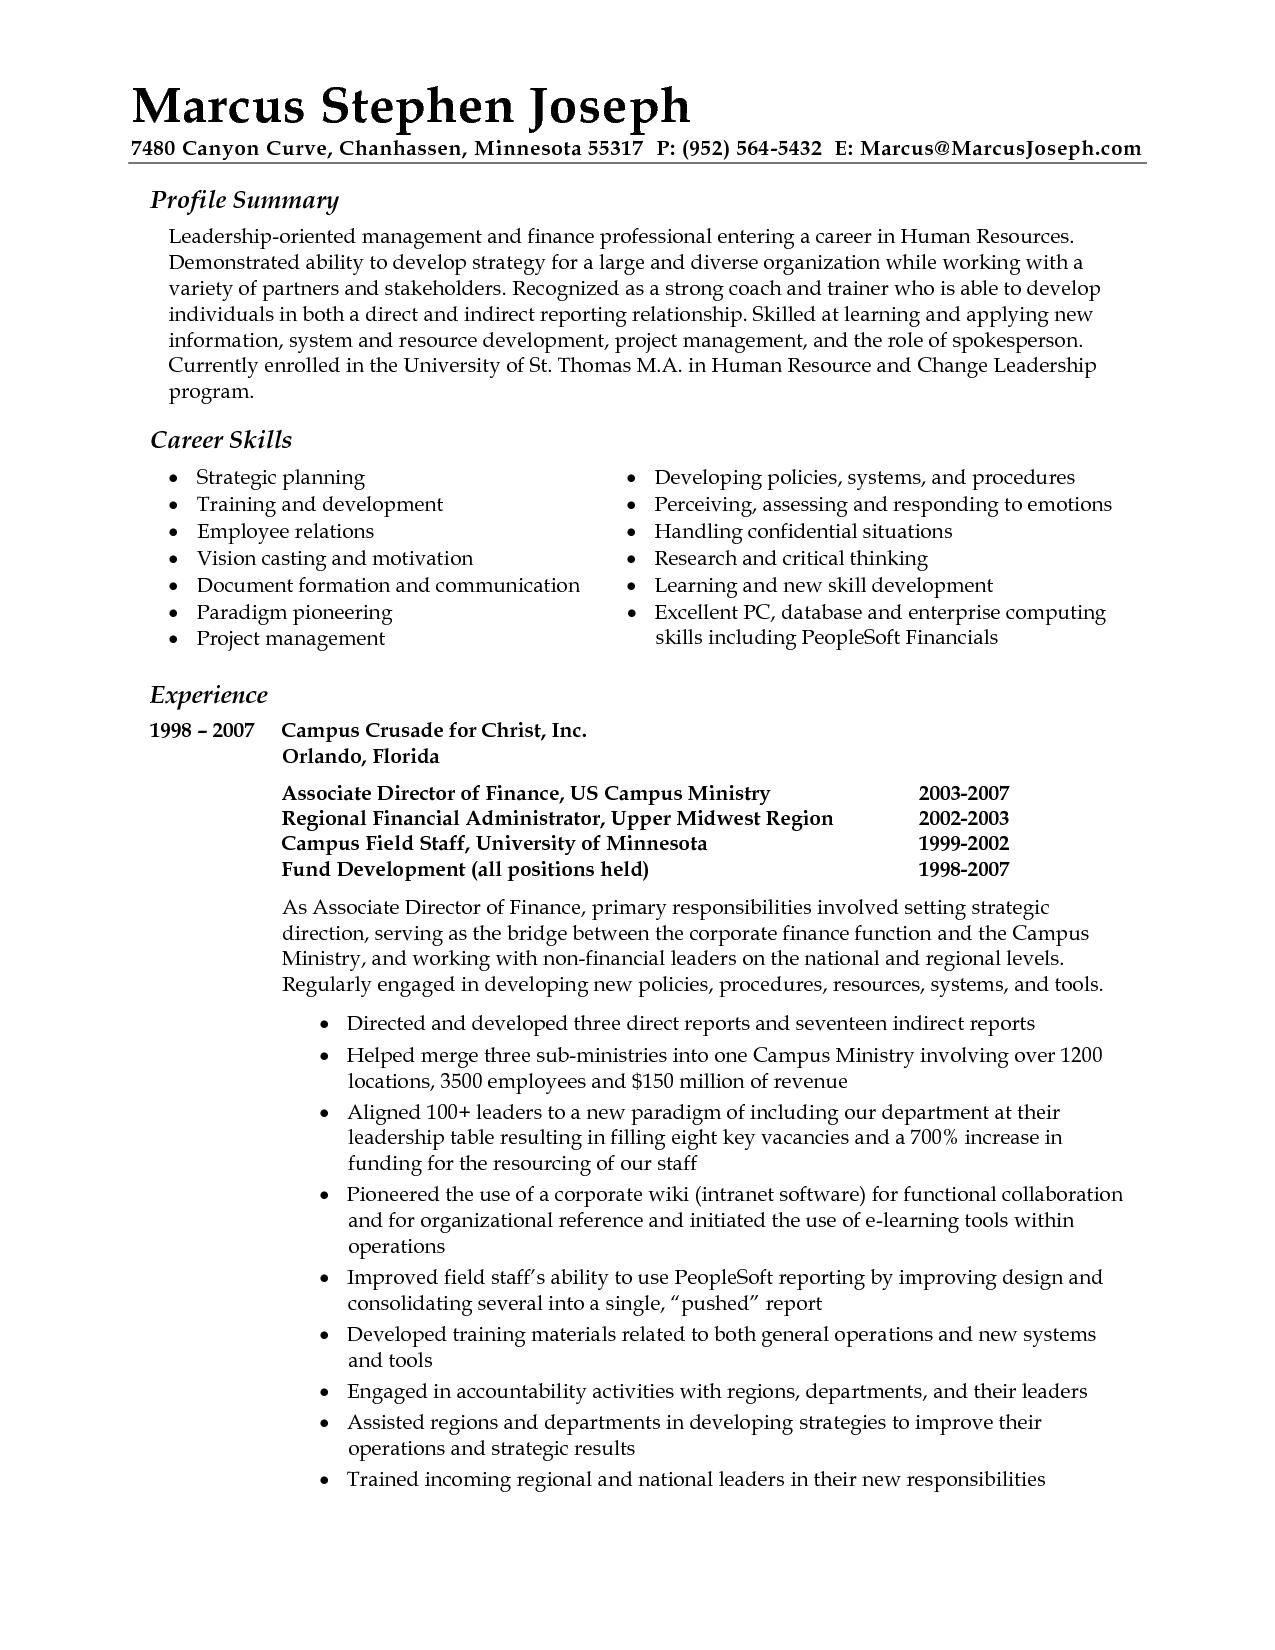 summary on resume examples pinterest